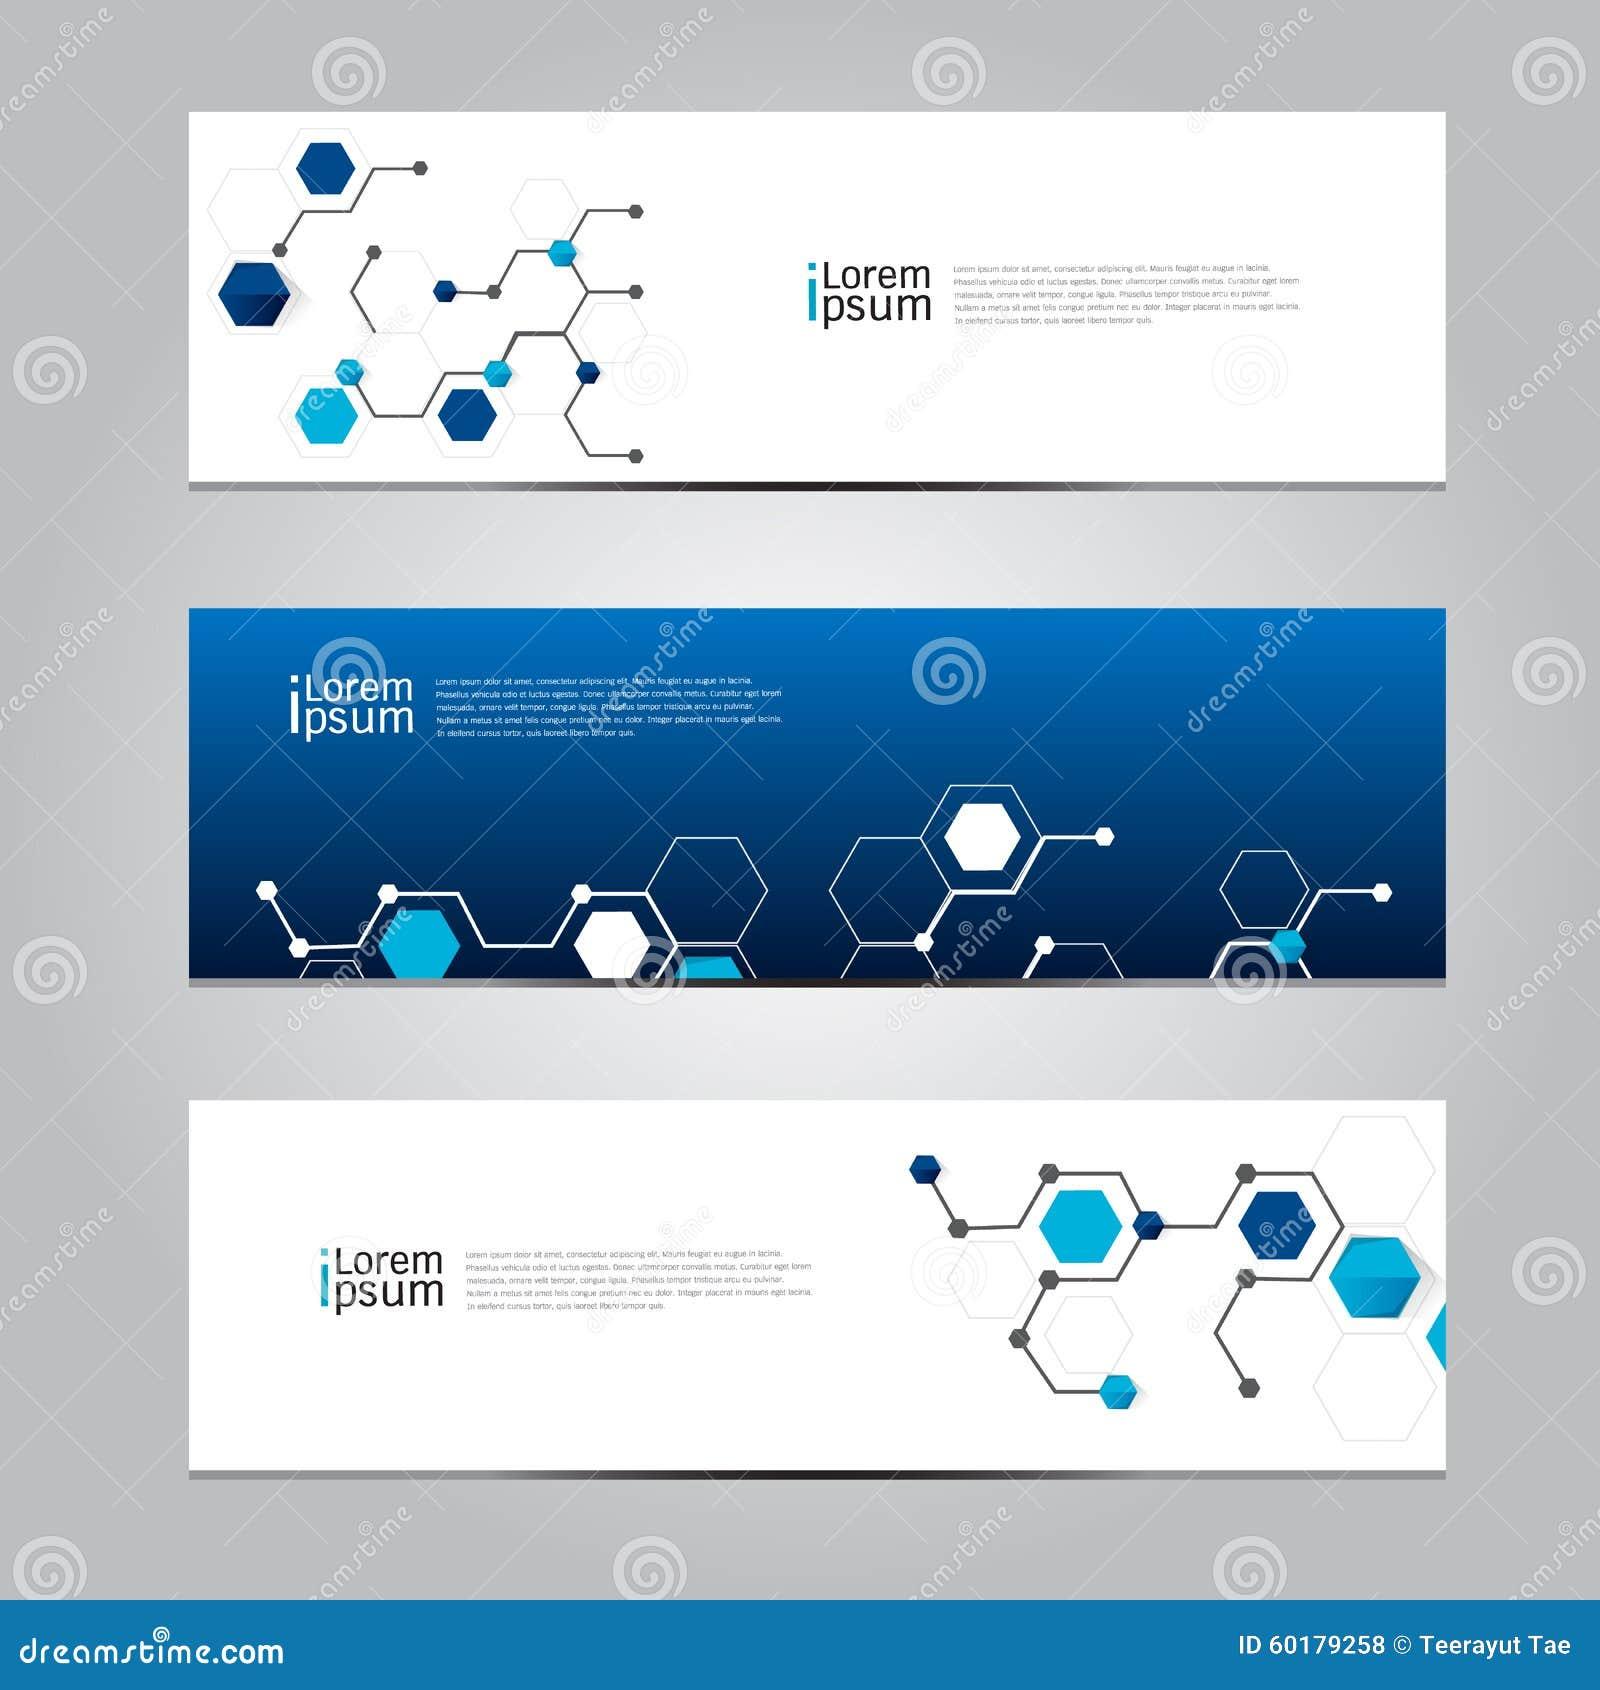 vector design banner technology background  stock vector